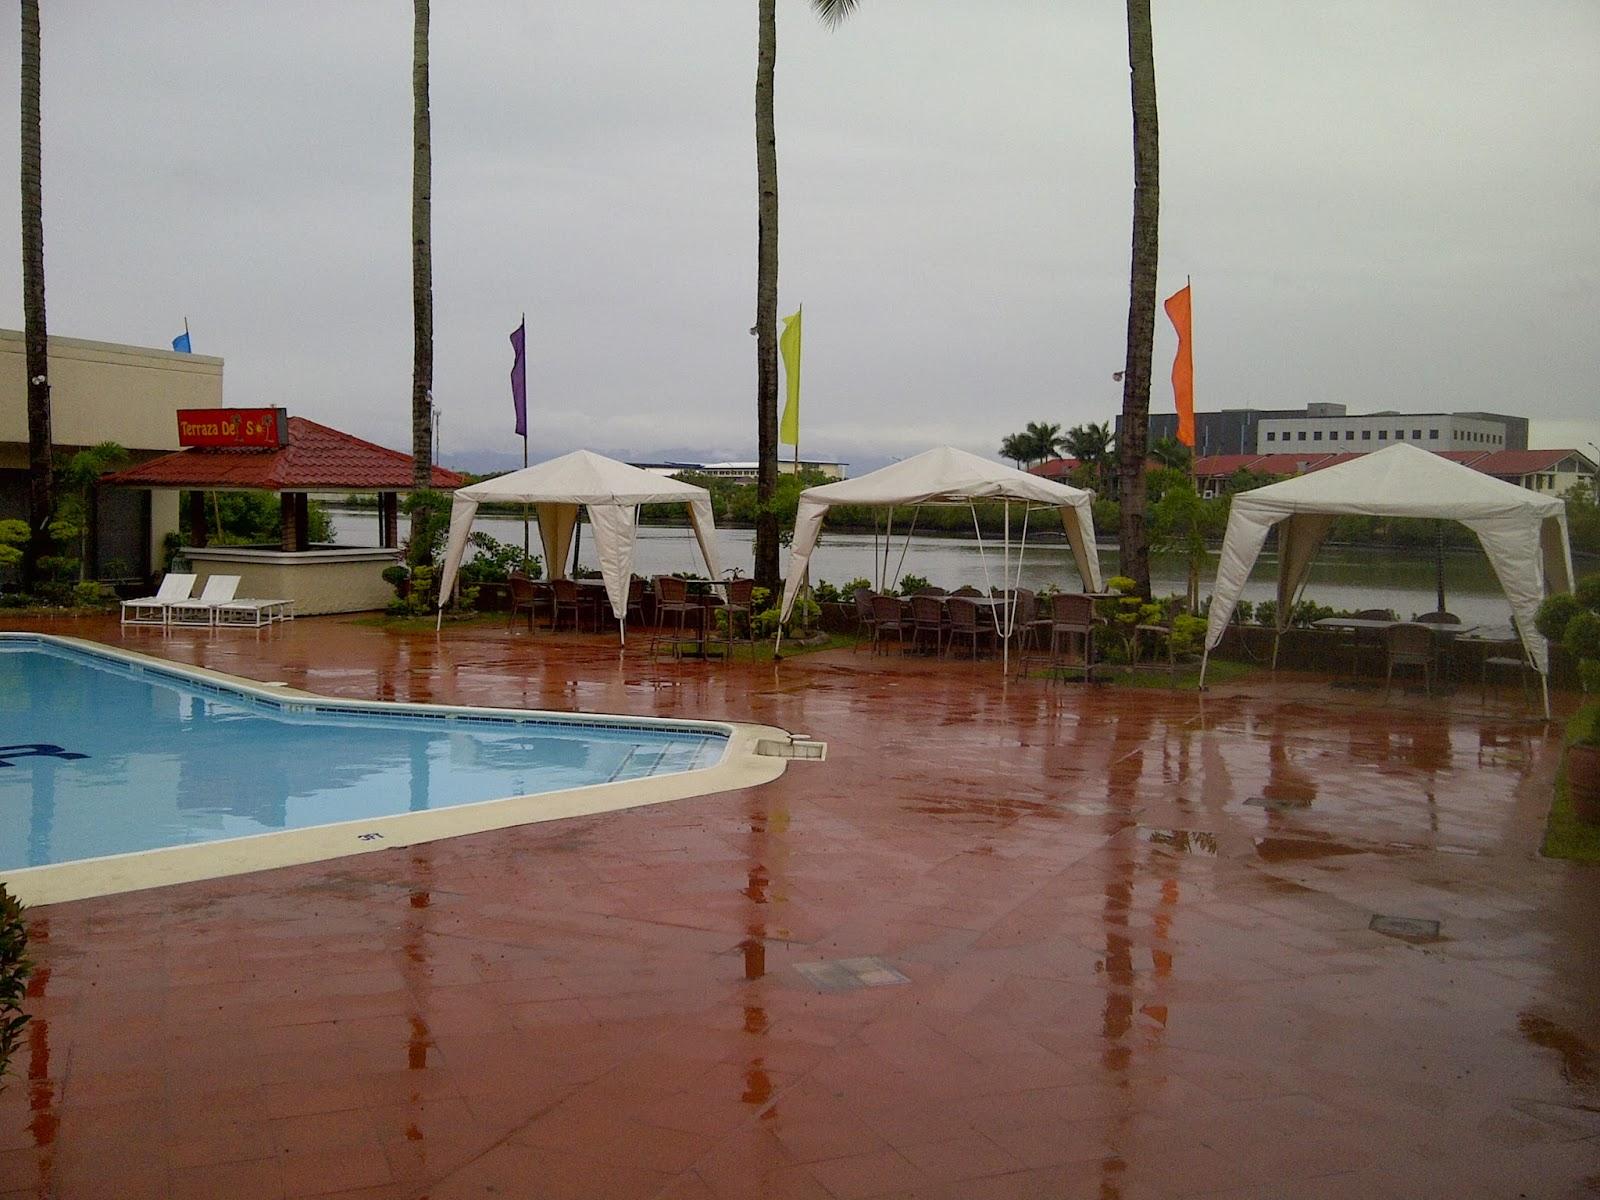 The Rich St Deli Always In Action Hotel Del Rio